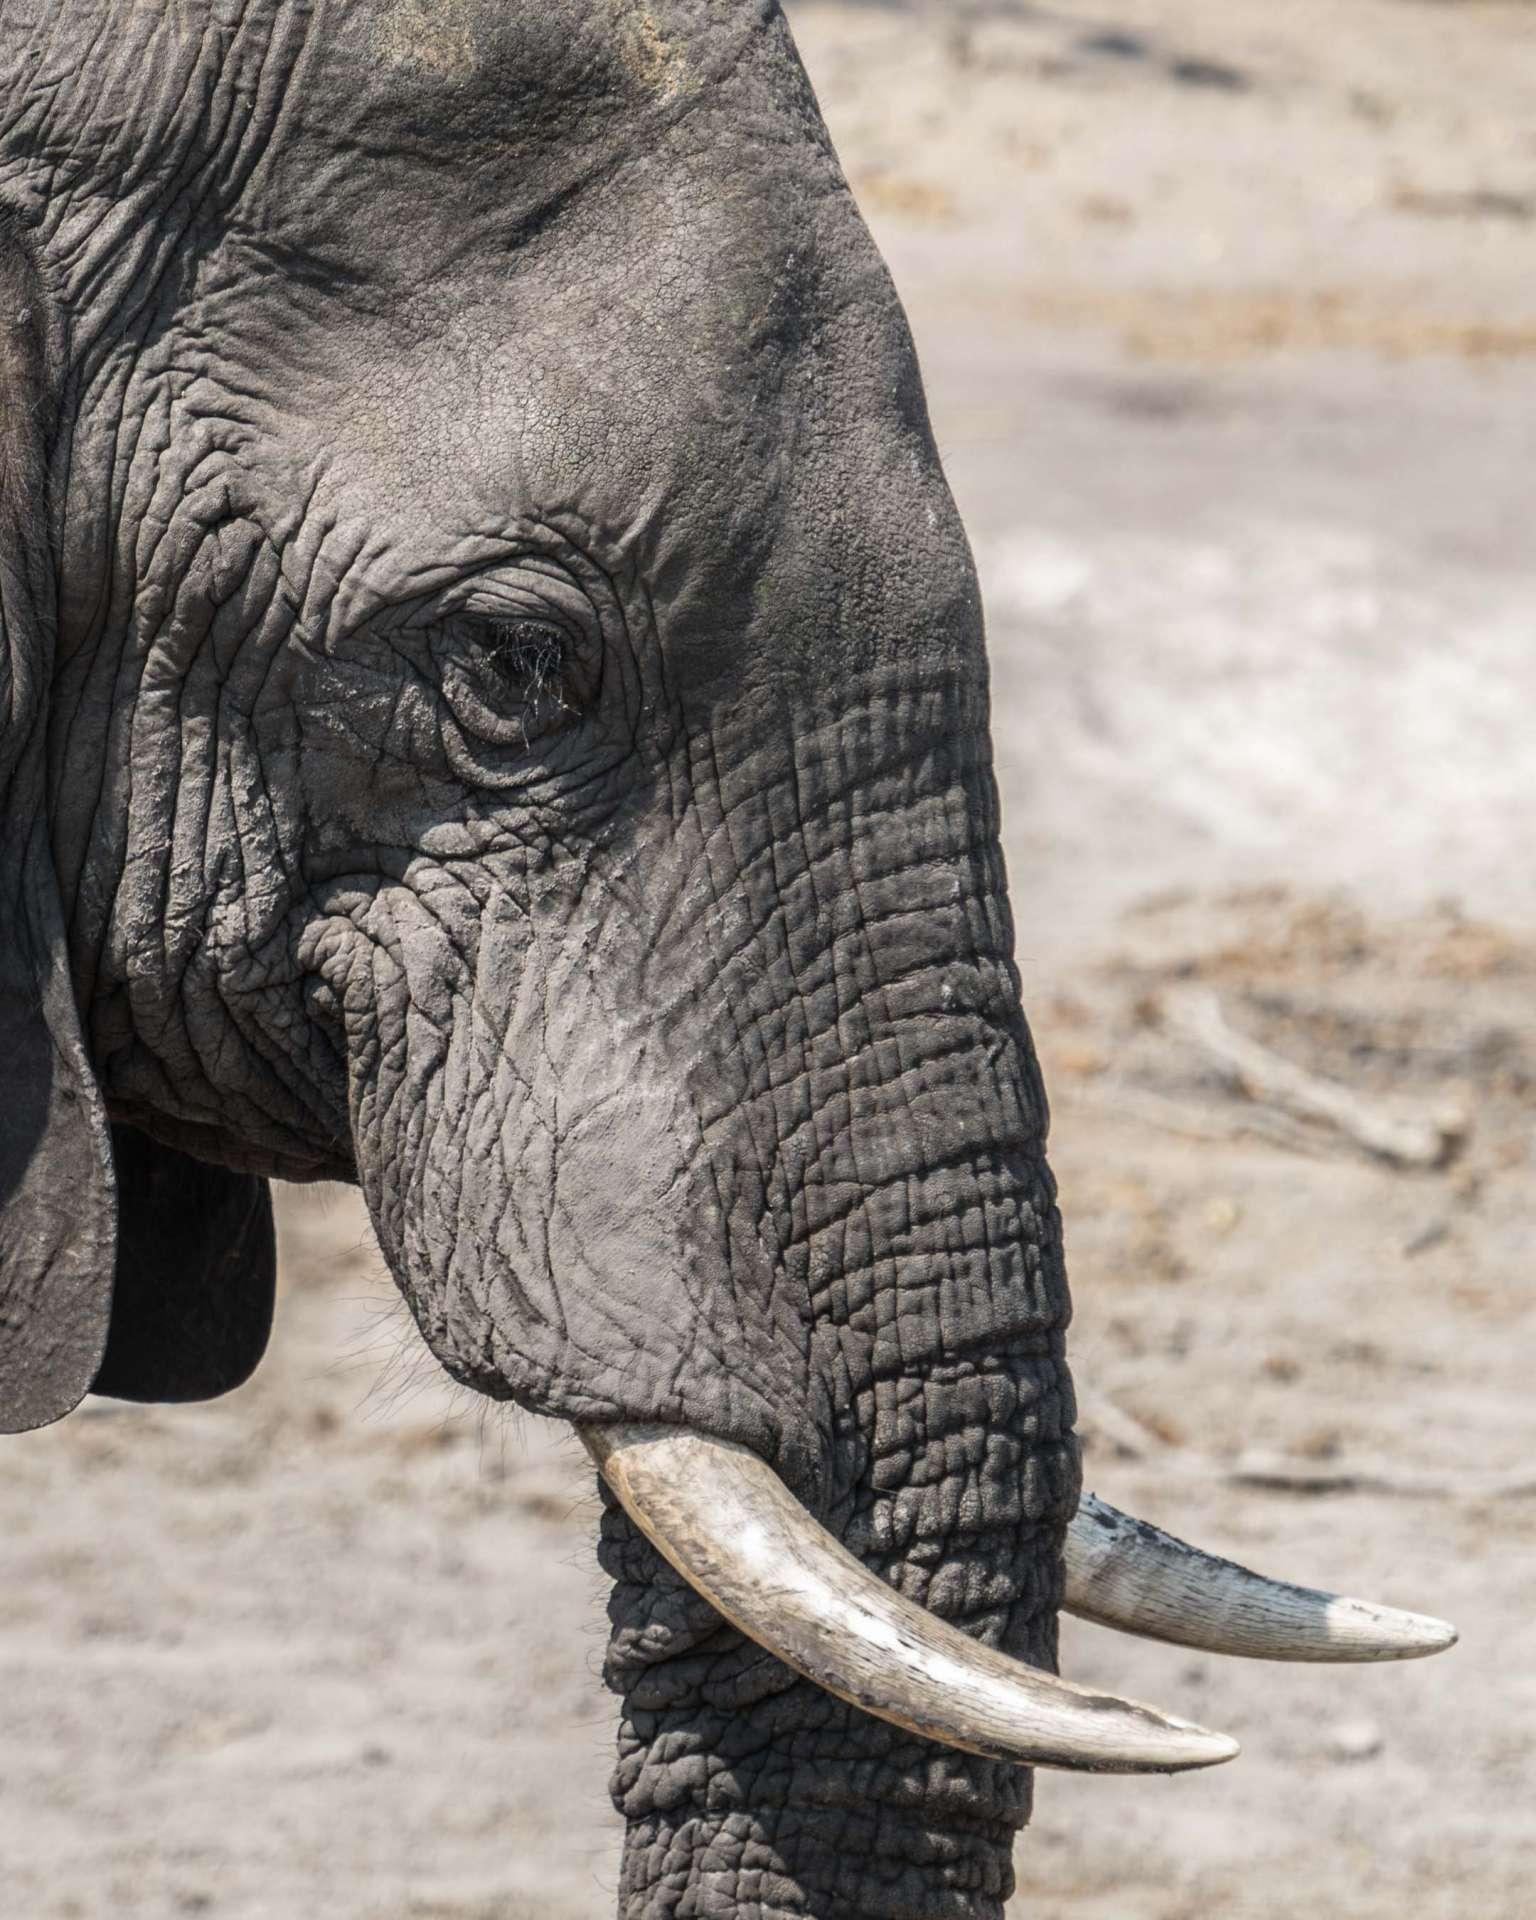 Victoria Falls Zimbawe Enrico Pescantini Chobe day trip elephant close up